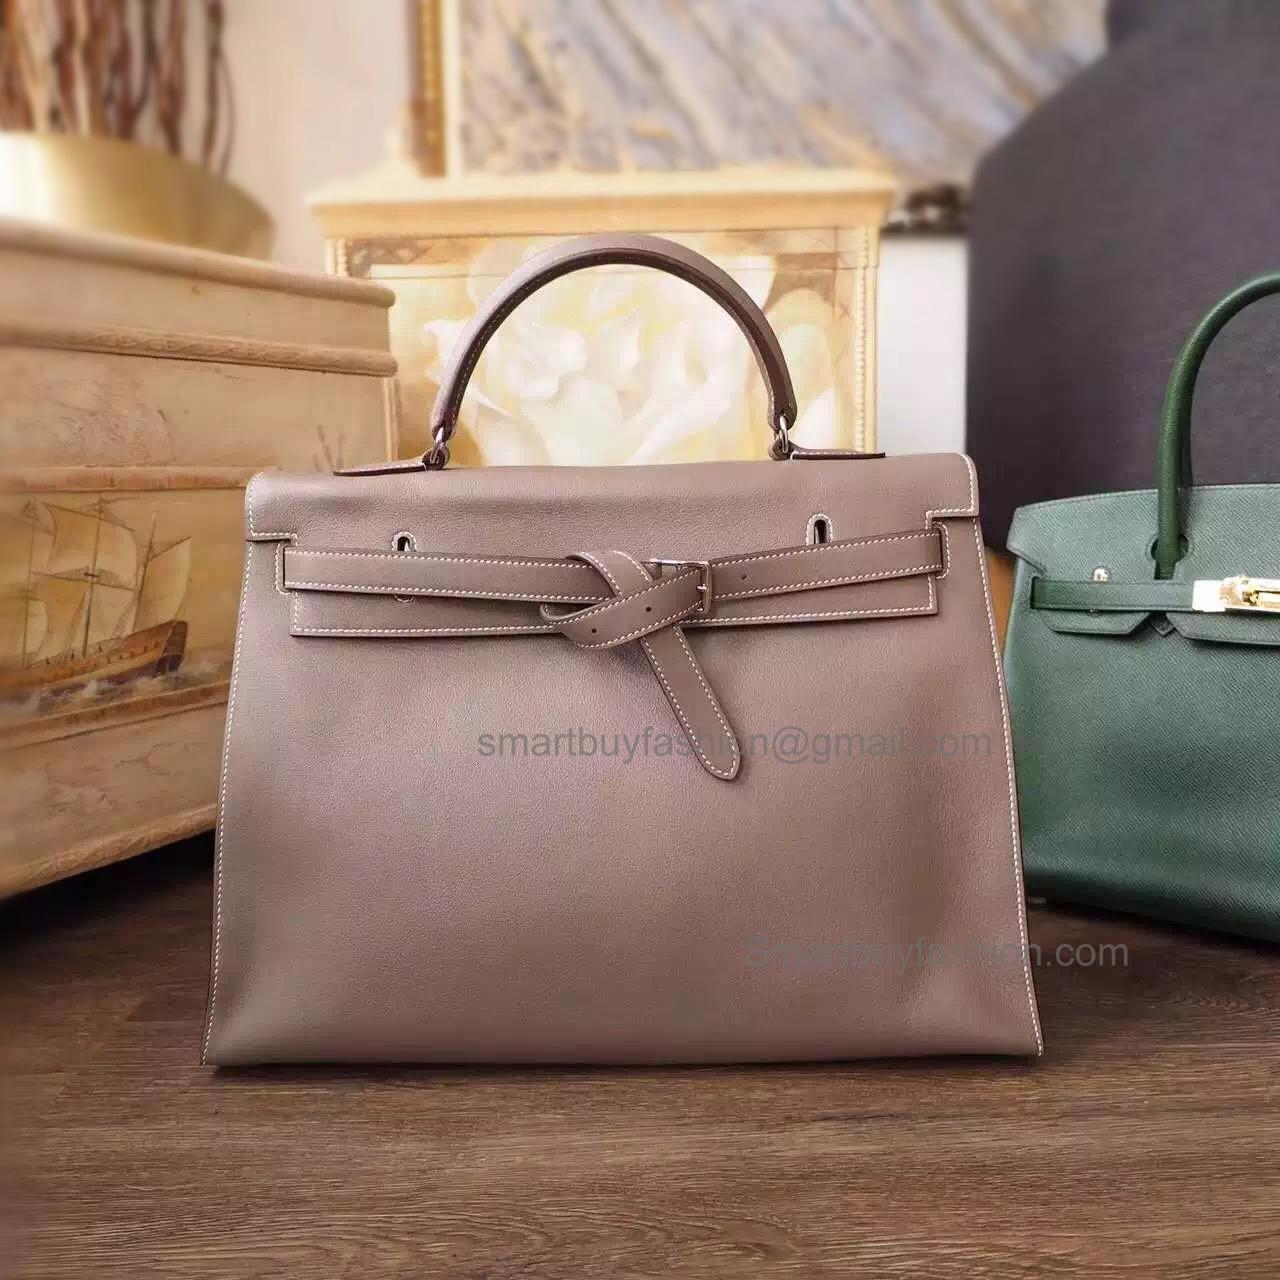 87753231b5 Handmade Hermes Kelly Flat 35 Replica Bag in ck18 Etoupe Swift Calfskin PHW  -